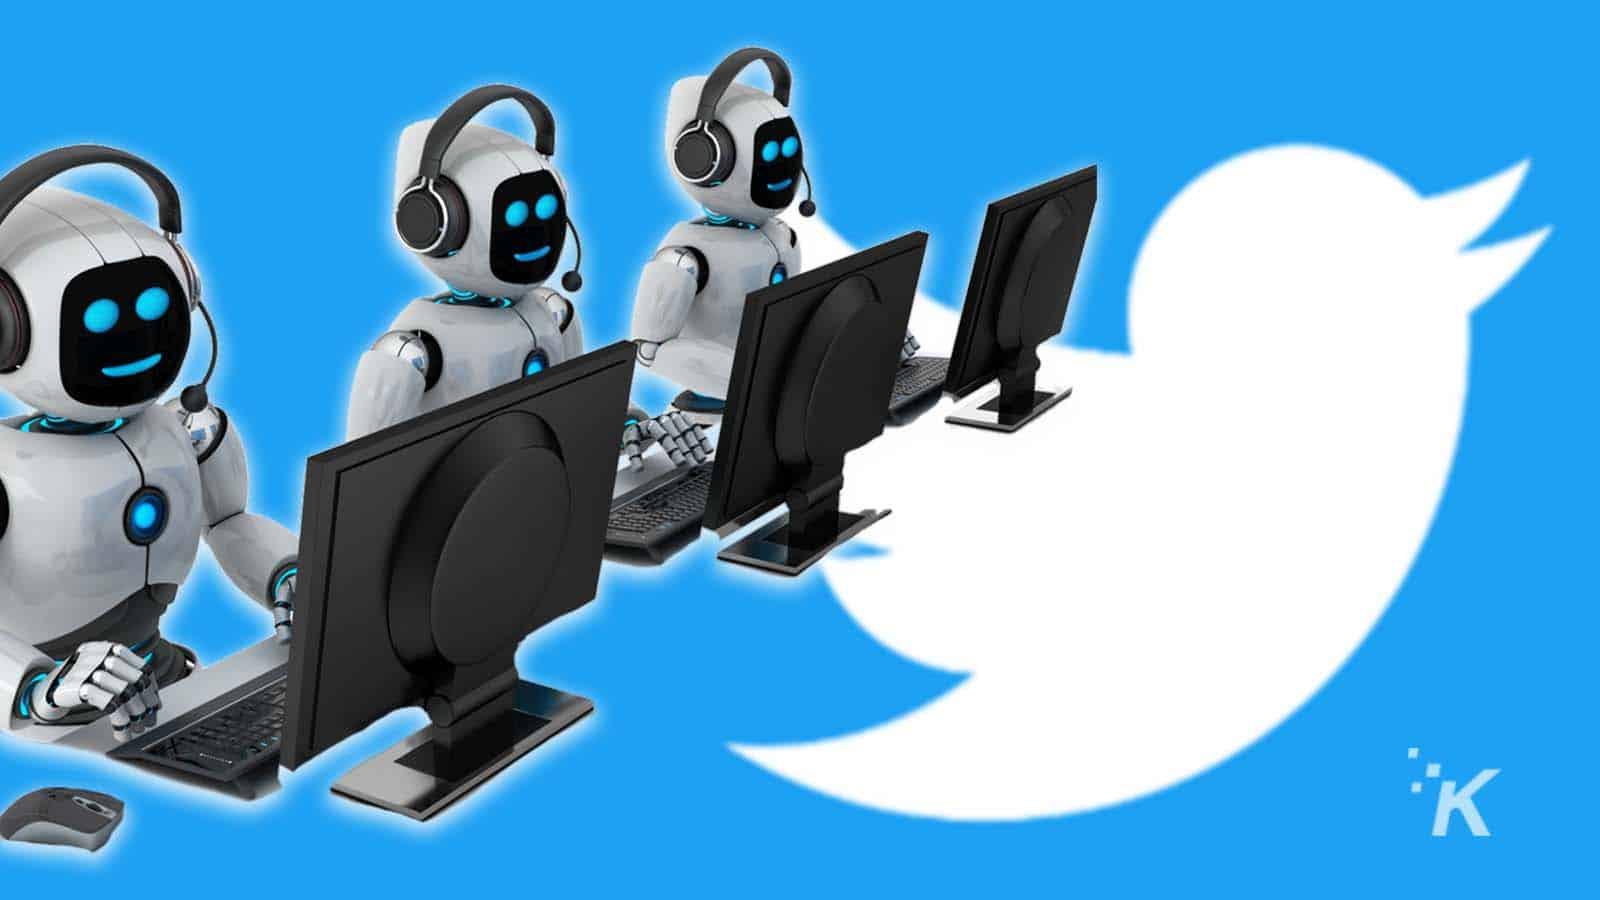 twitter bots on twitter background